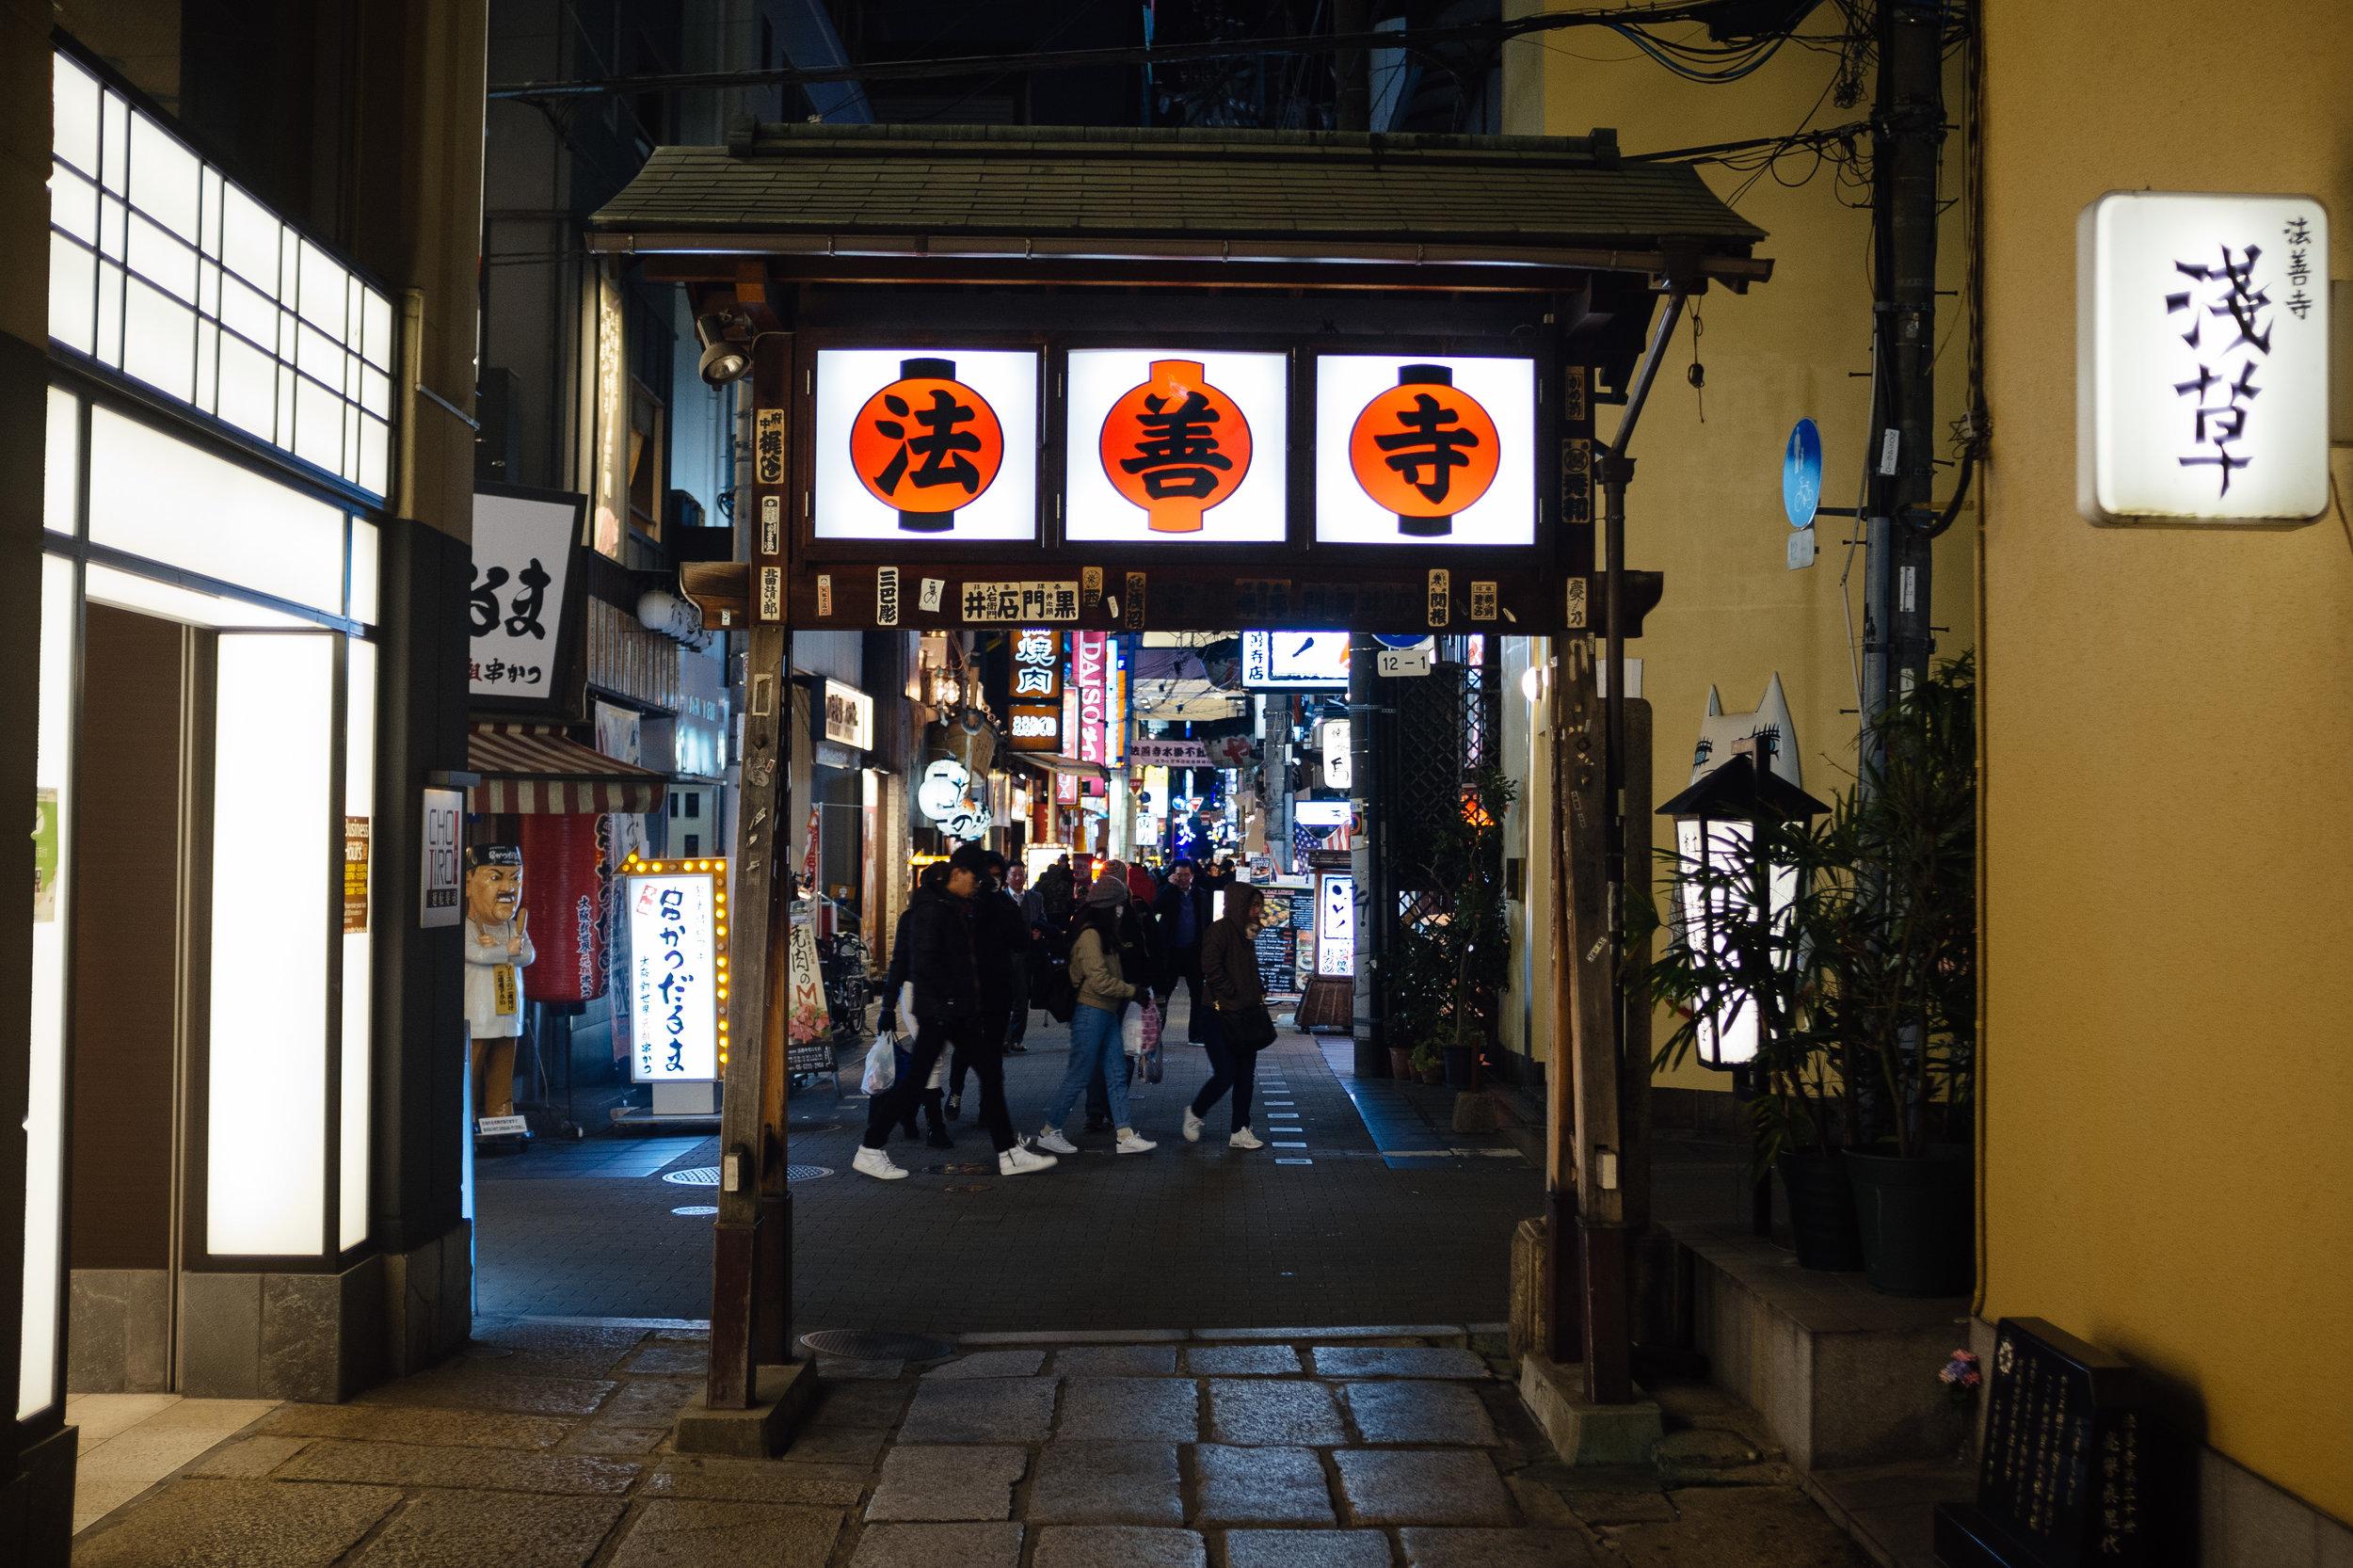 Osaka Sign 2.jpg